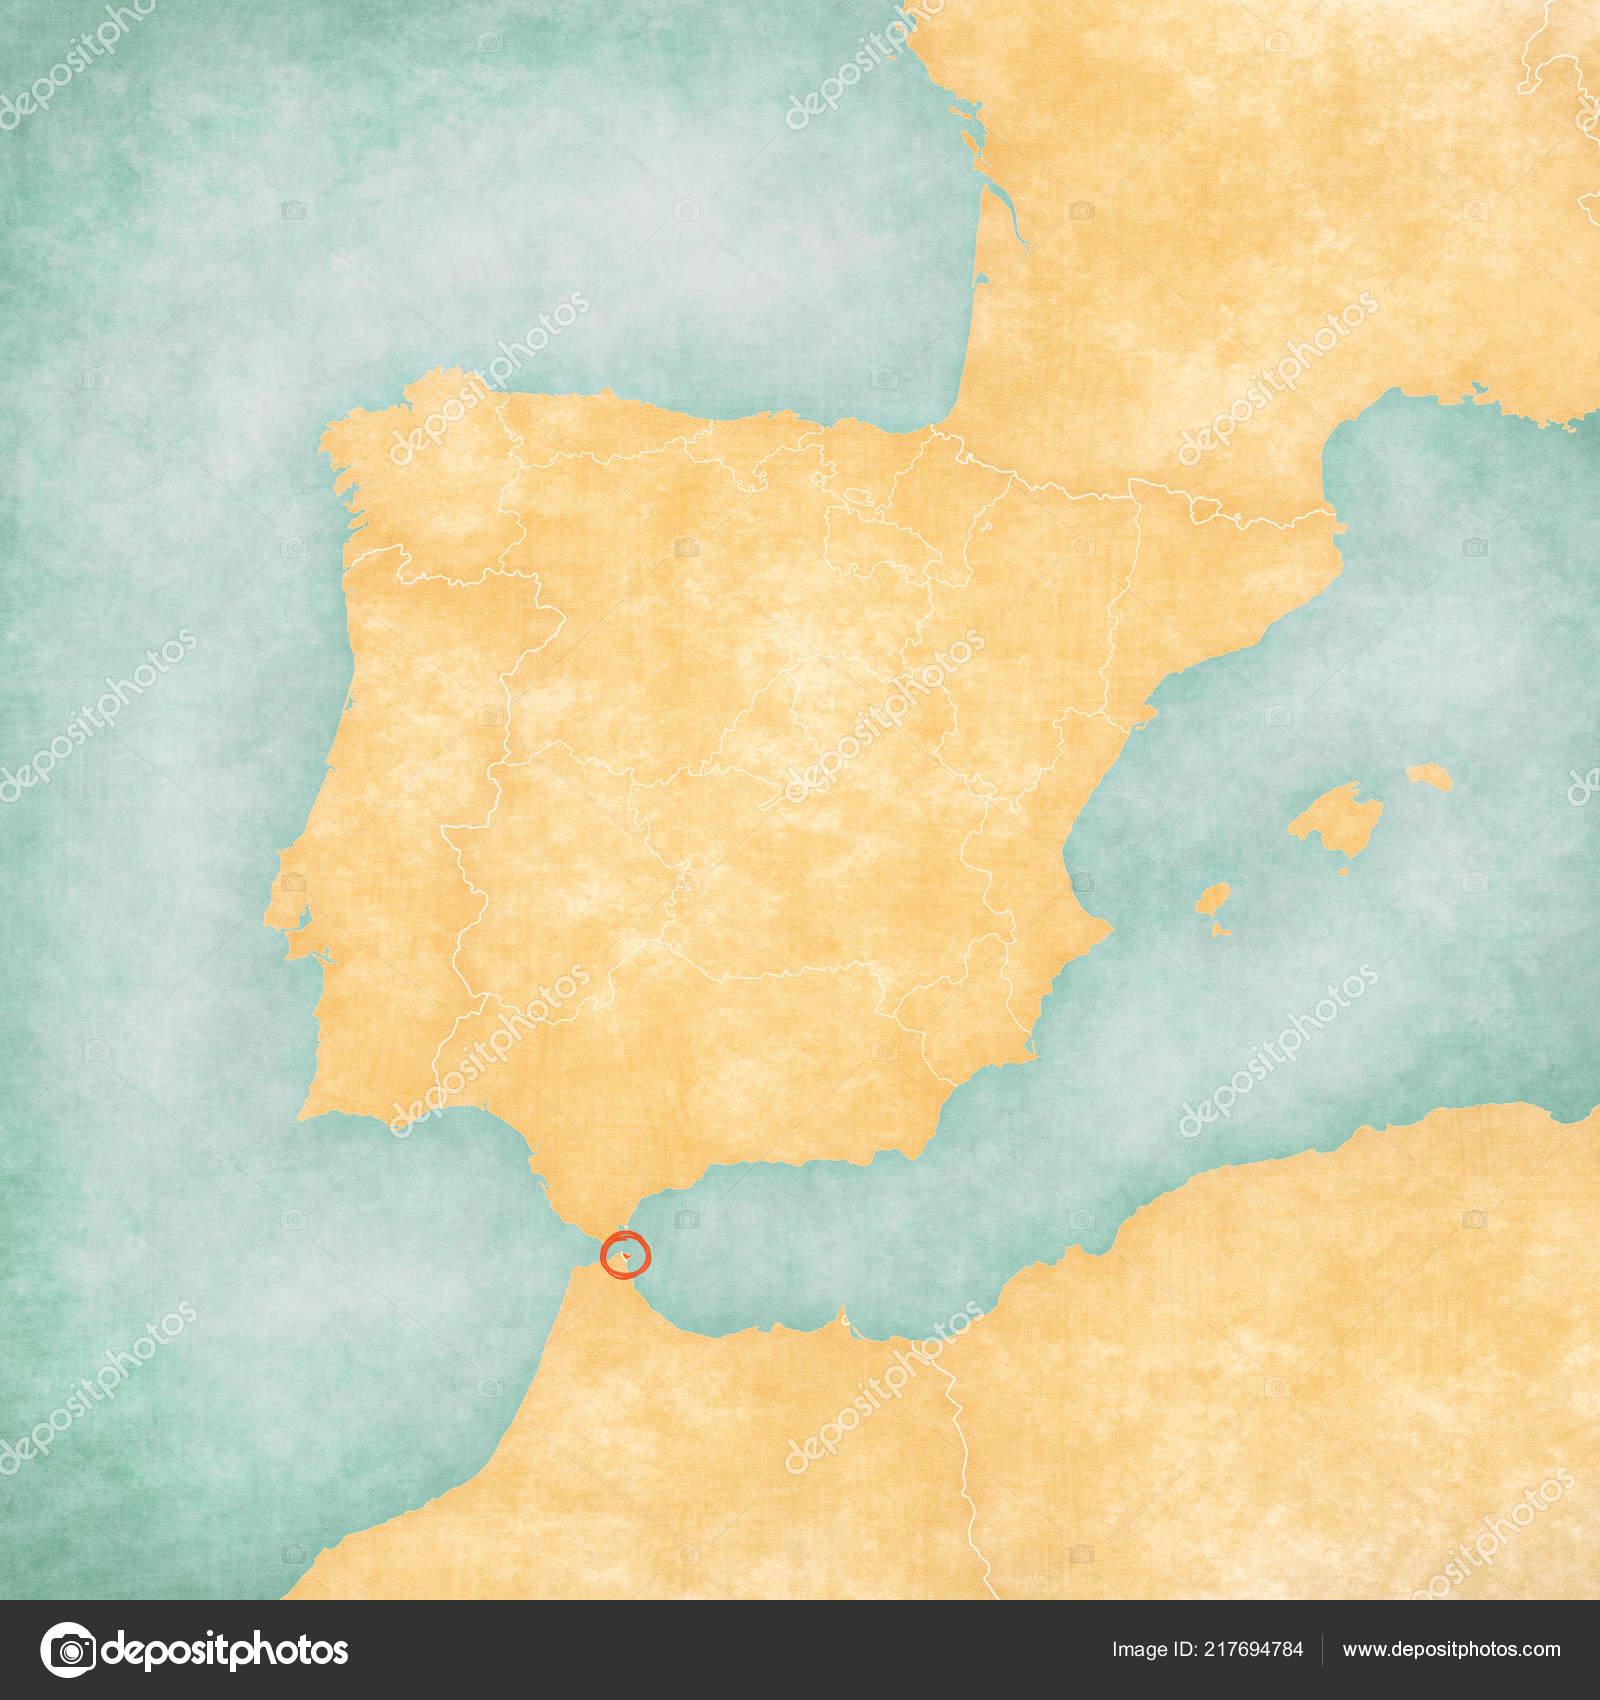 Ceuta Map on